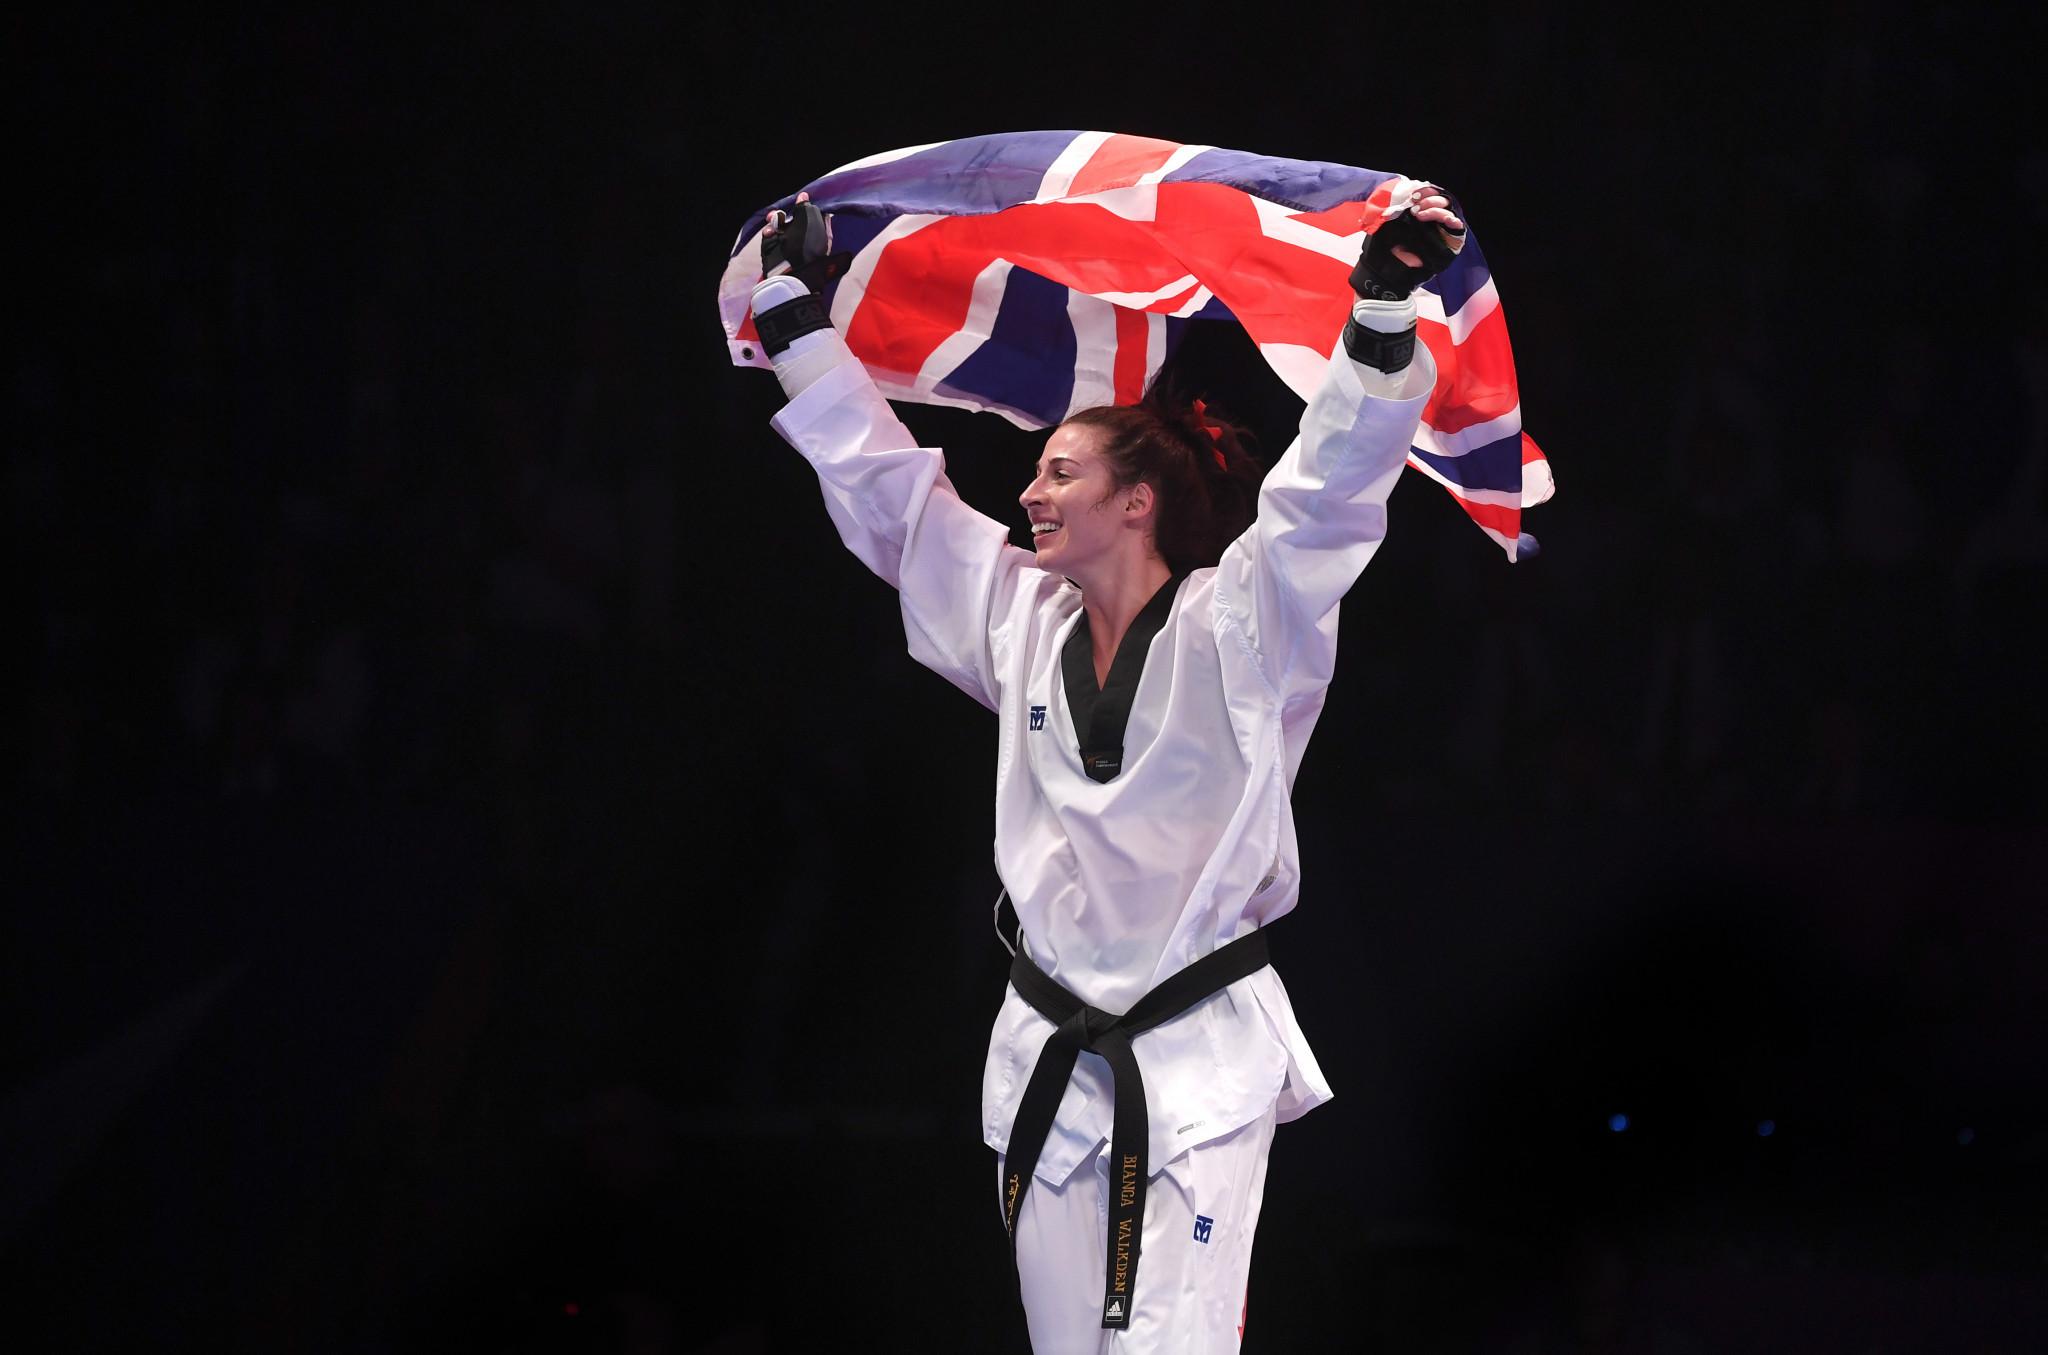 Walkden and McGowan triumph on golden last day of European Taekwondo Championships for Britain